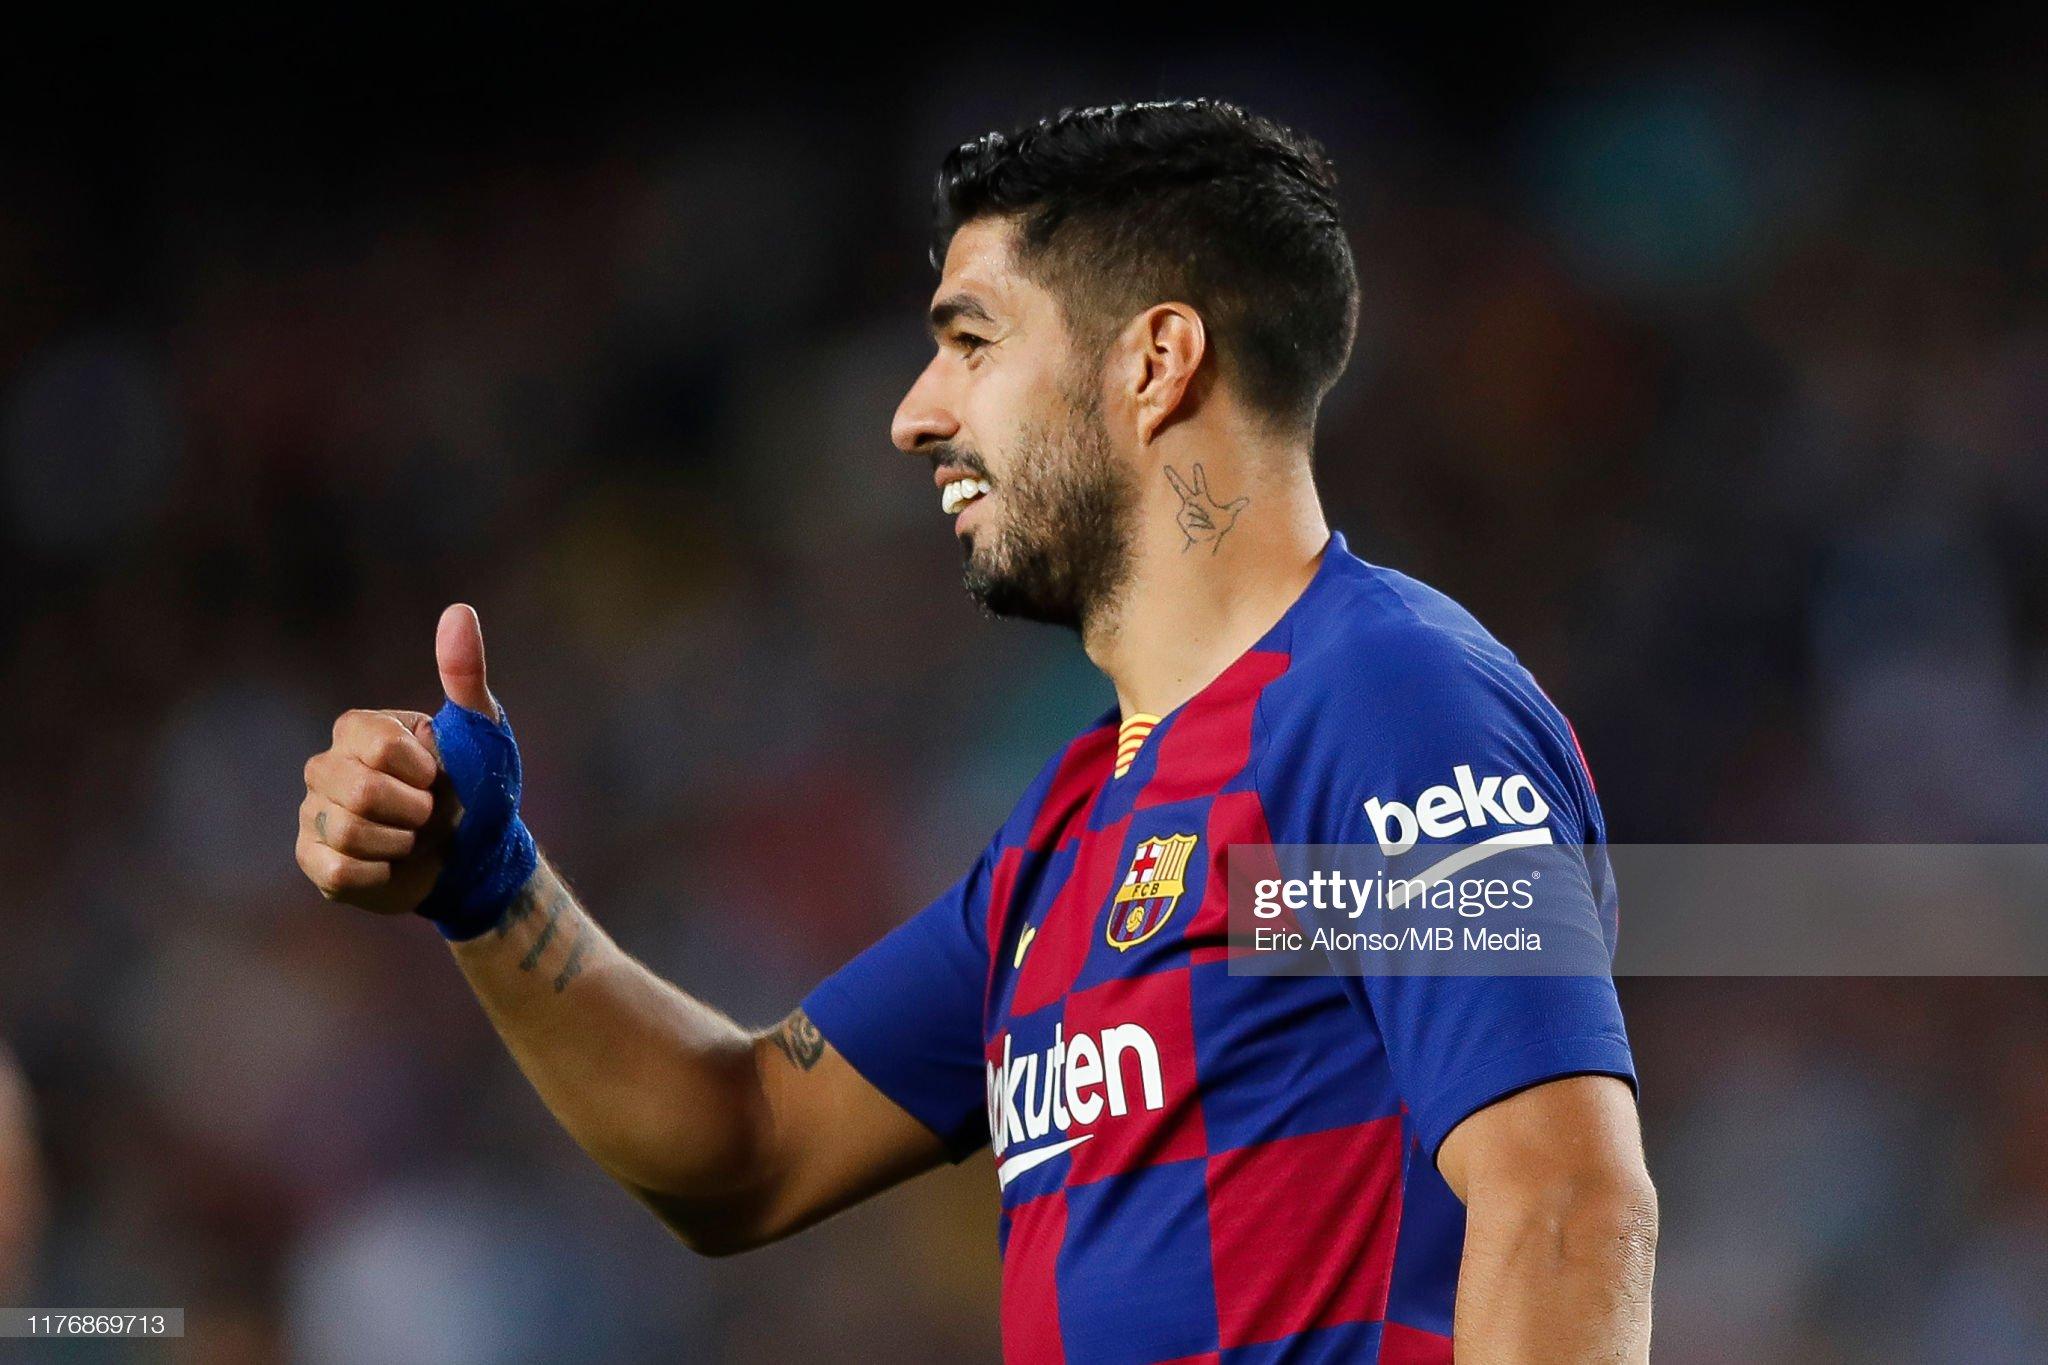 صور مباراة : برشلونة - فياريال 2-1 ( 24-09-2019 )  Luis-suarez-of-fc-barcelona-waves-the-supporters-during-the-liga-fc-picture-id1176869713?s=2048x2048